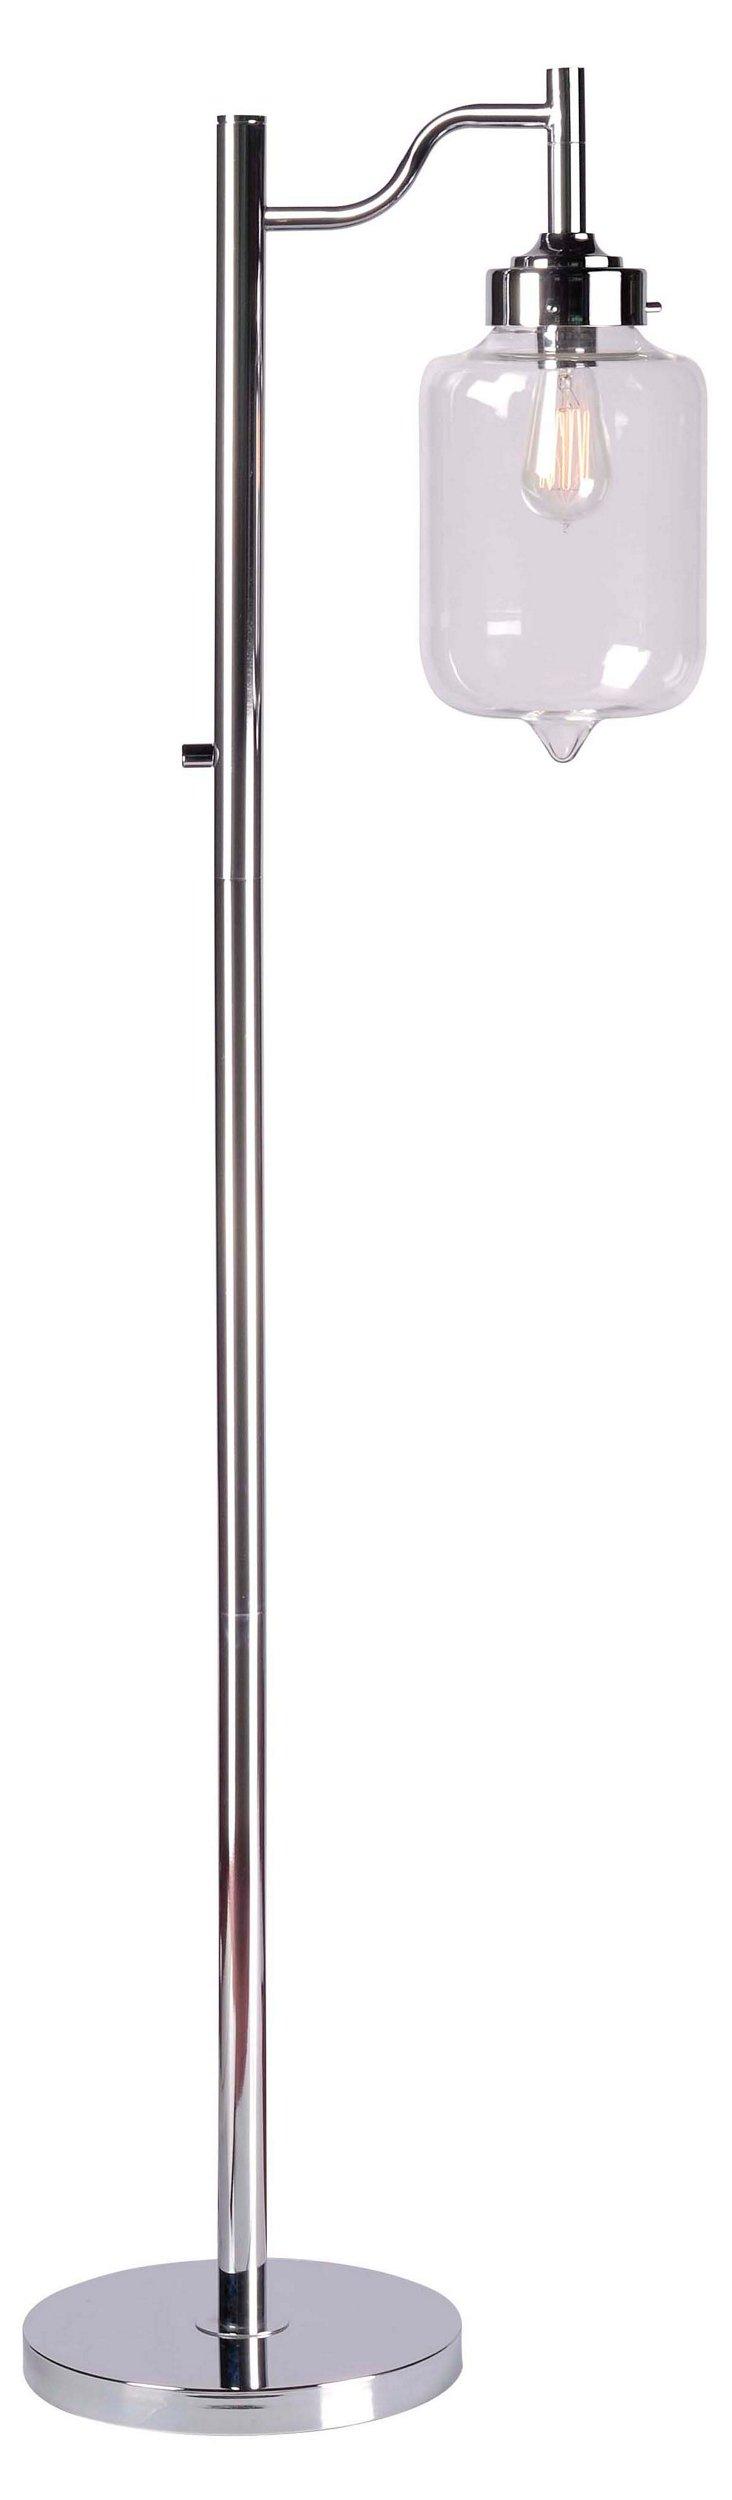 Concord Floor Lamp, Chrome